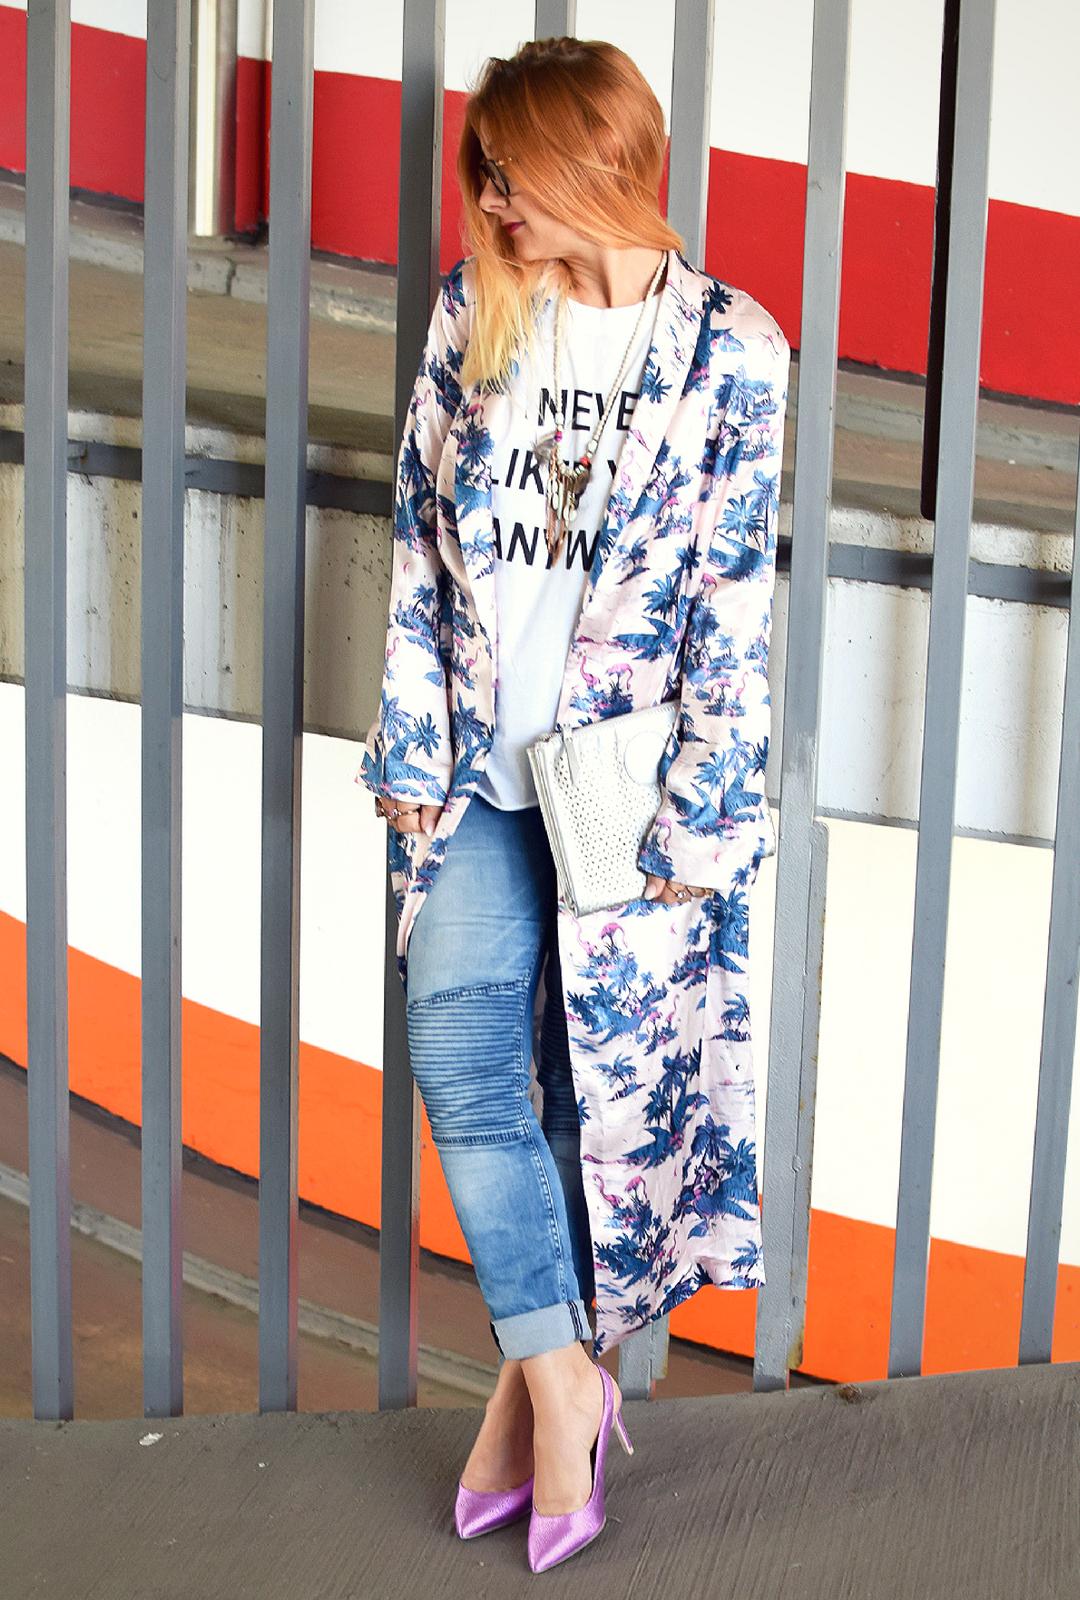 Damen Kimono stylen, Stylingtipp für Kimono